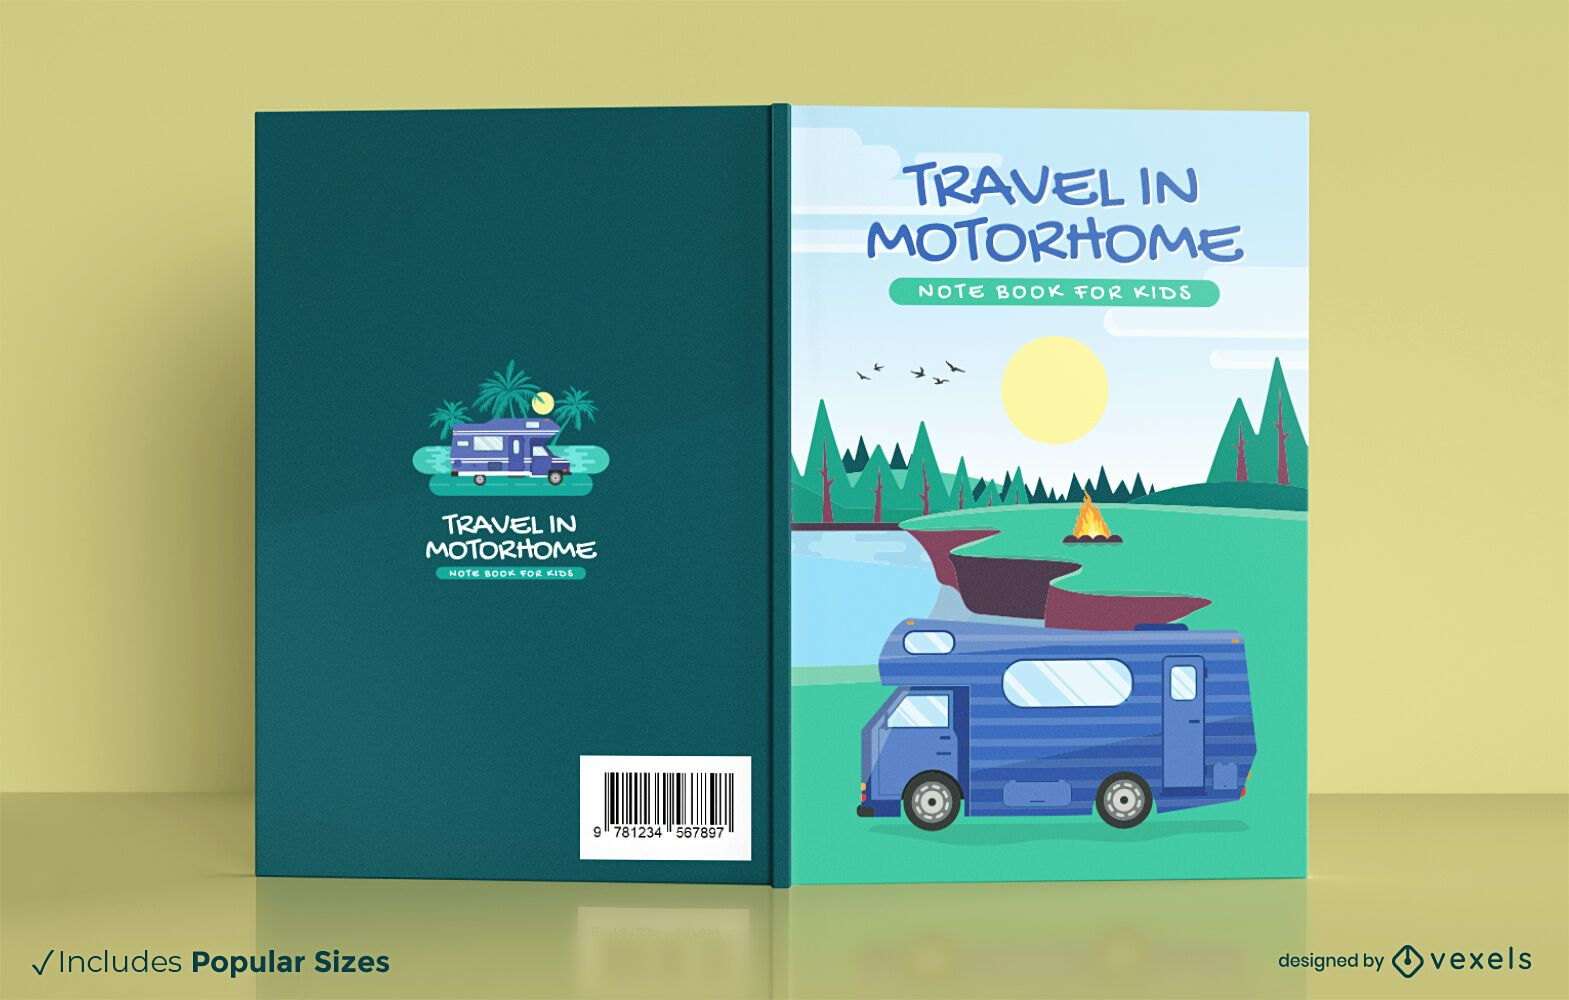 Travel motorhome notebook cover design